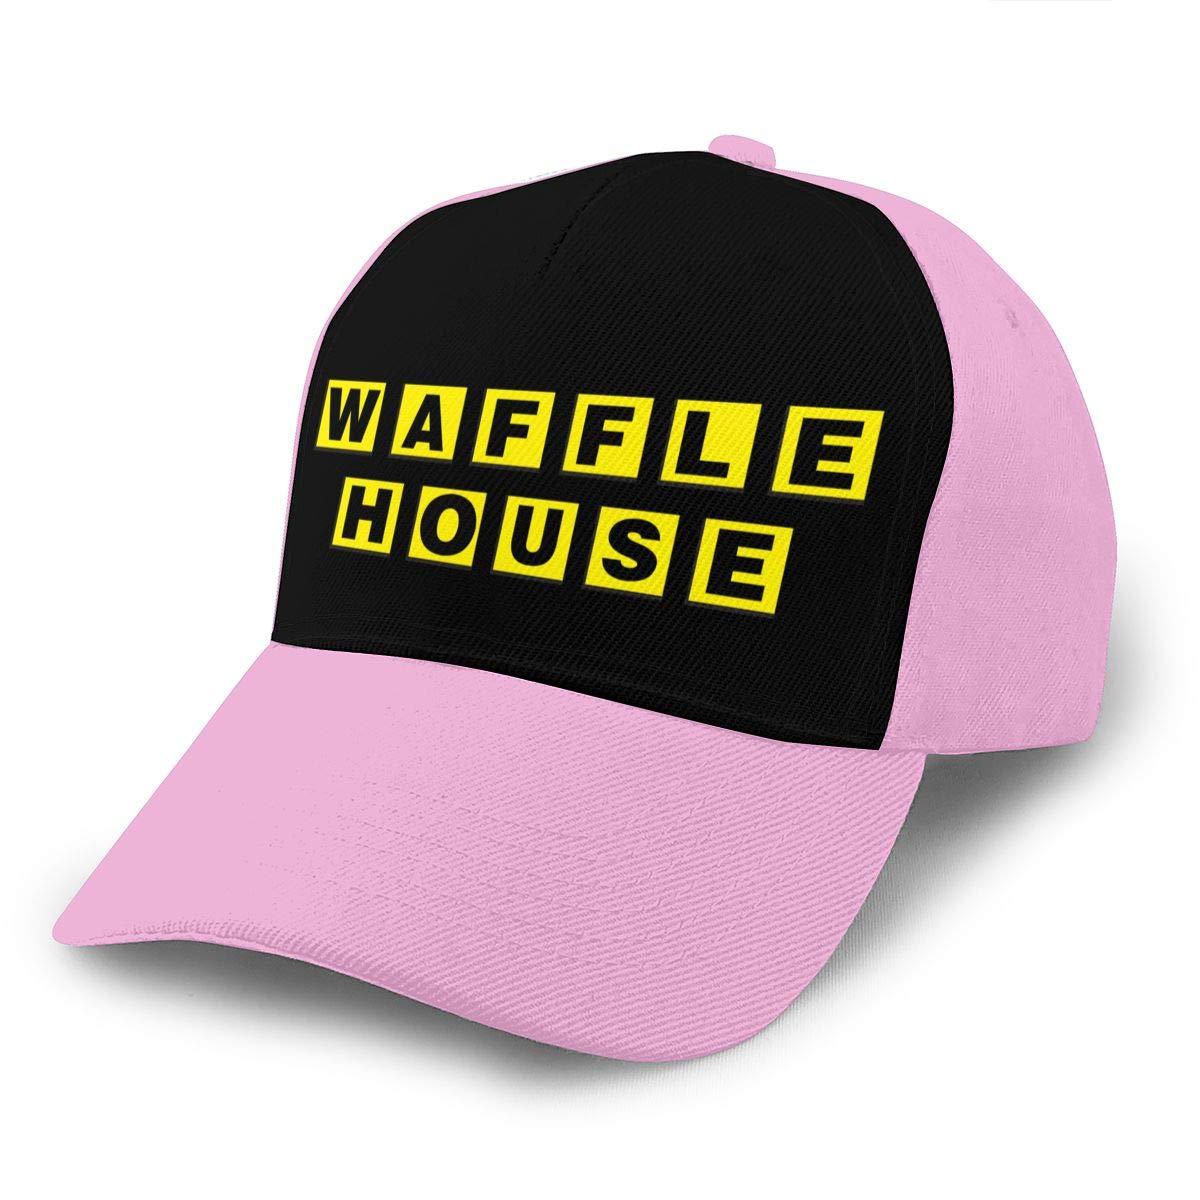 Adjustable Women Men Waffle-House-Logo Print Baseball Cap Flat Brim Cap Hats Hip Hop Snapback Sun Hat Boys Girls Pink by Apolonia